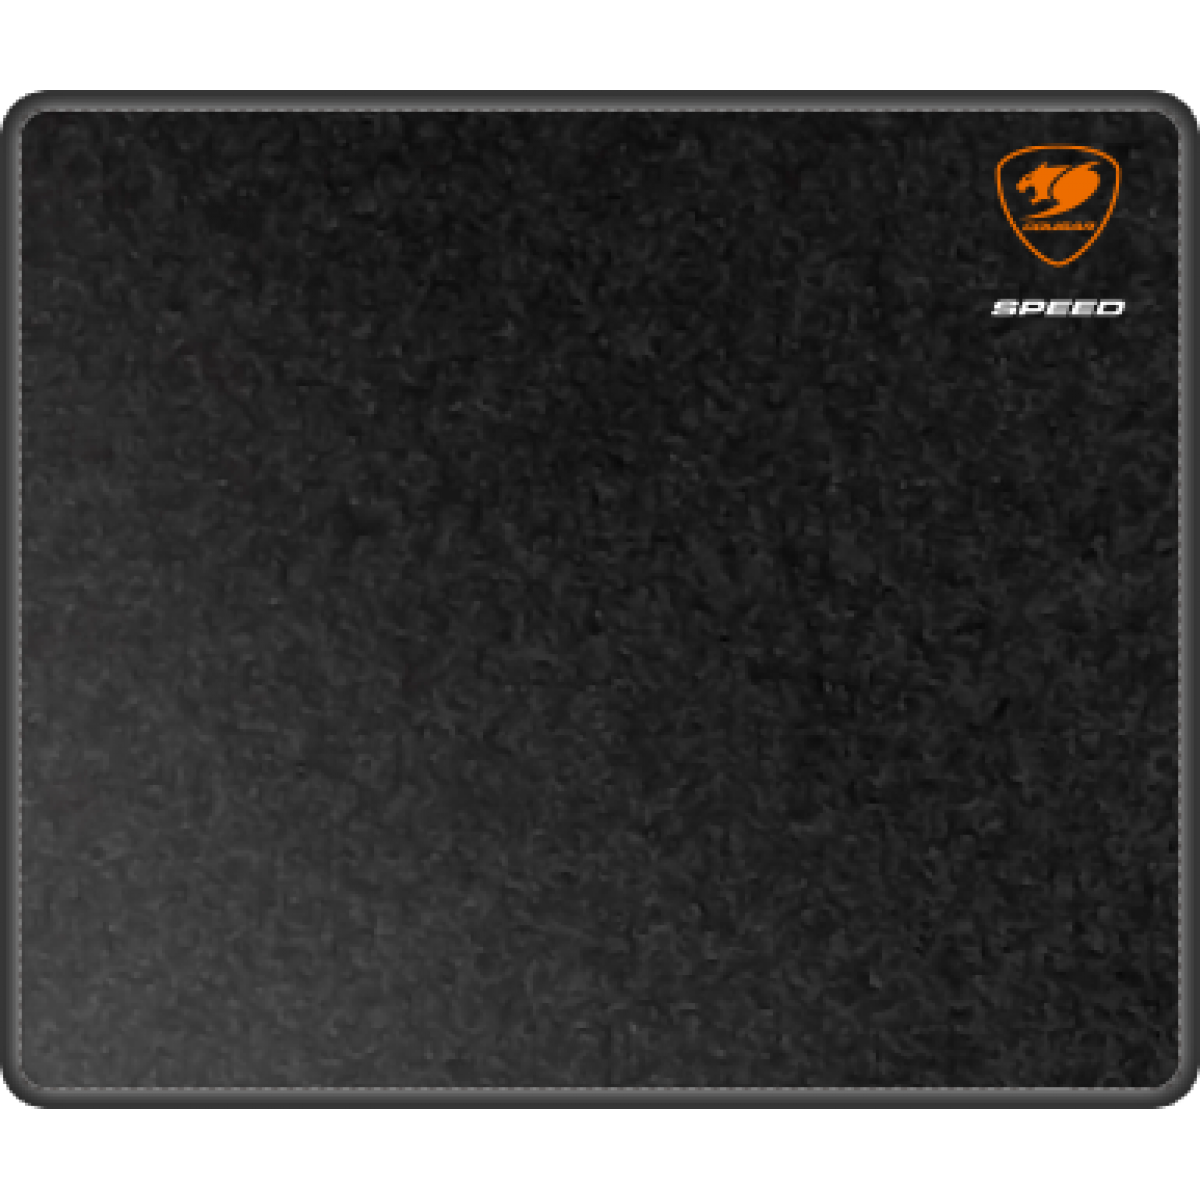 Mouse Pad Gamer Cougar Speed 2, Médio, CGR-BBRBS5M-SP2